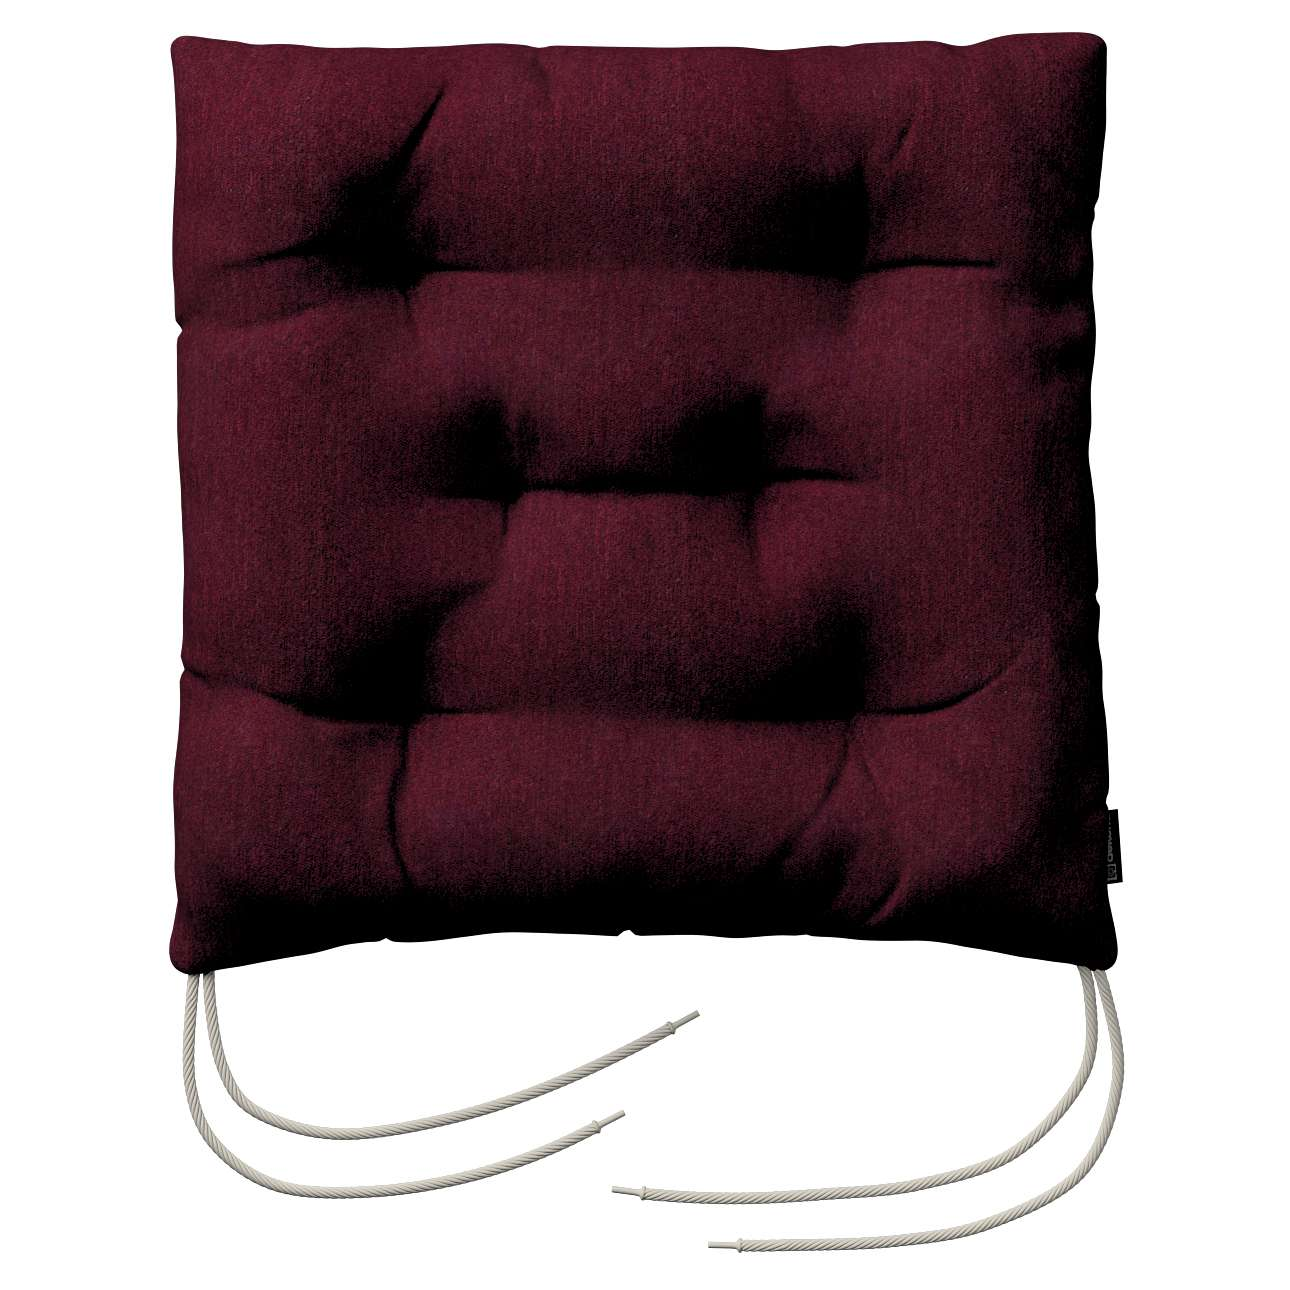 Kėdės pagalvėlė Jacek  40 x 40 x 8 cm kolekcijoje Chenille, audinys: 702-19